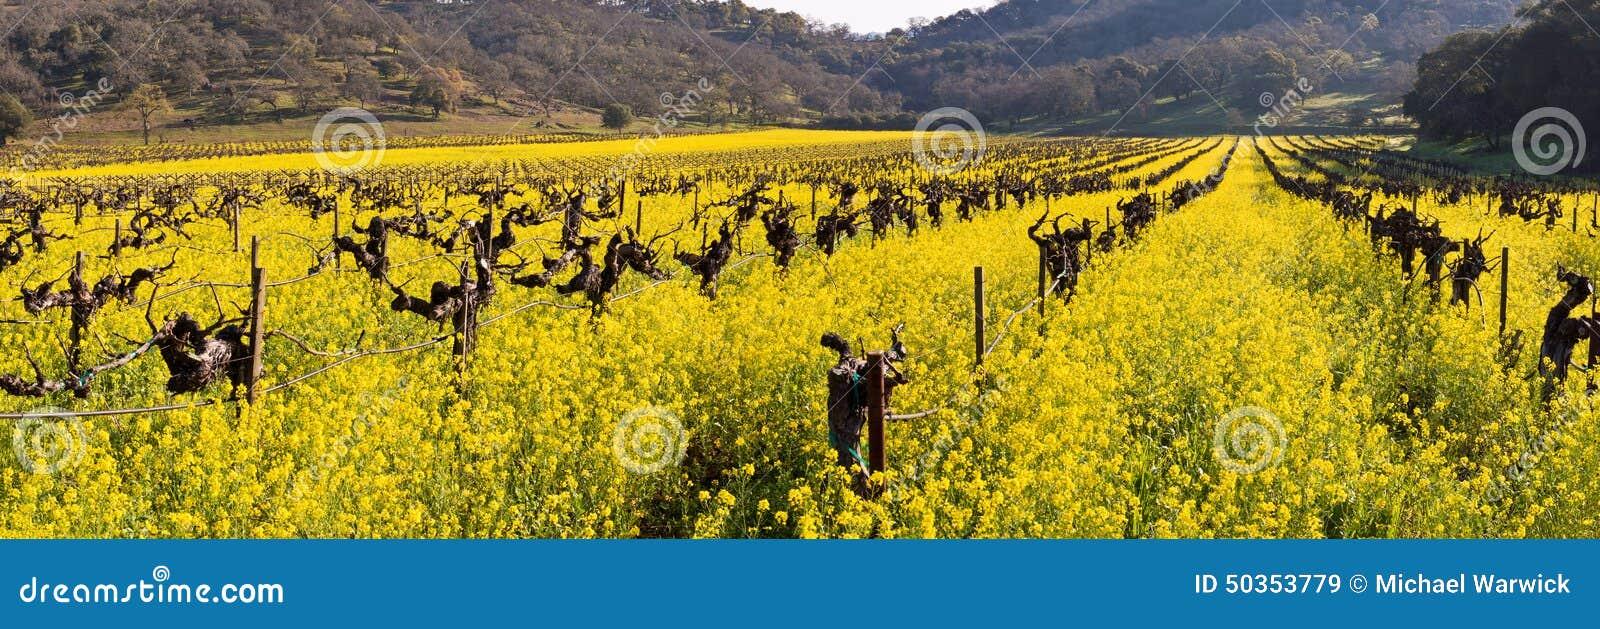 Napa Valley Vineyards And Spring Mustard